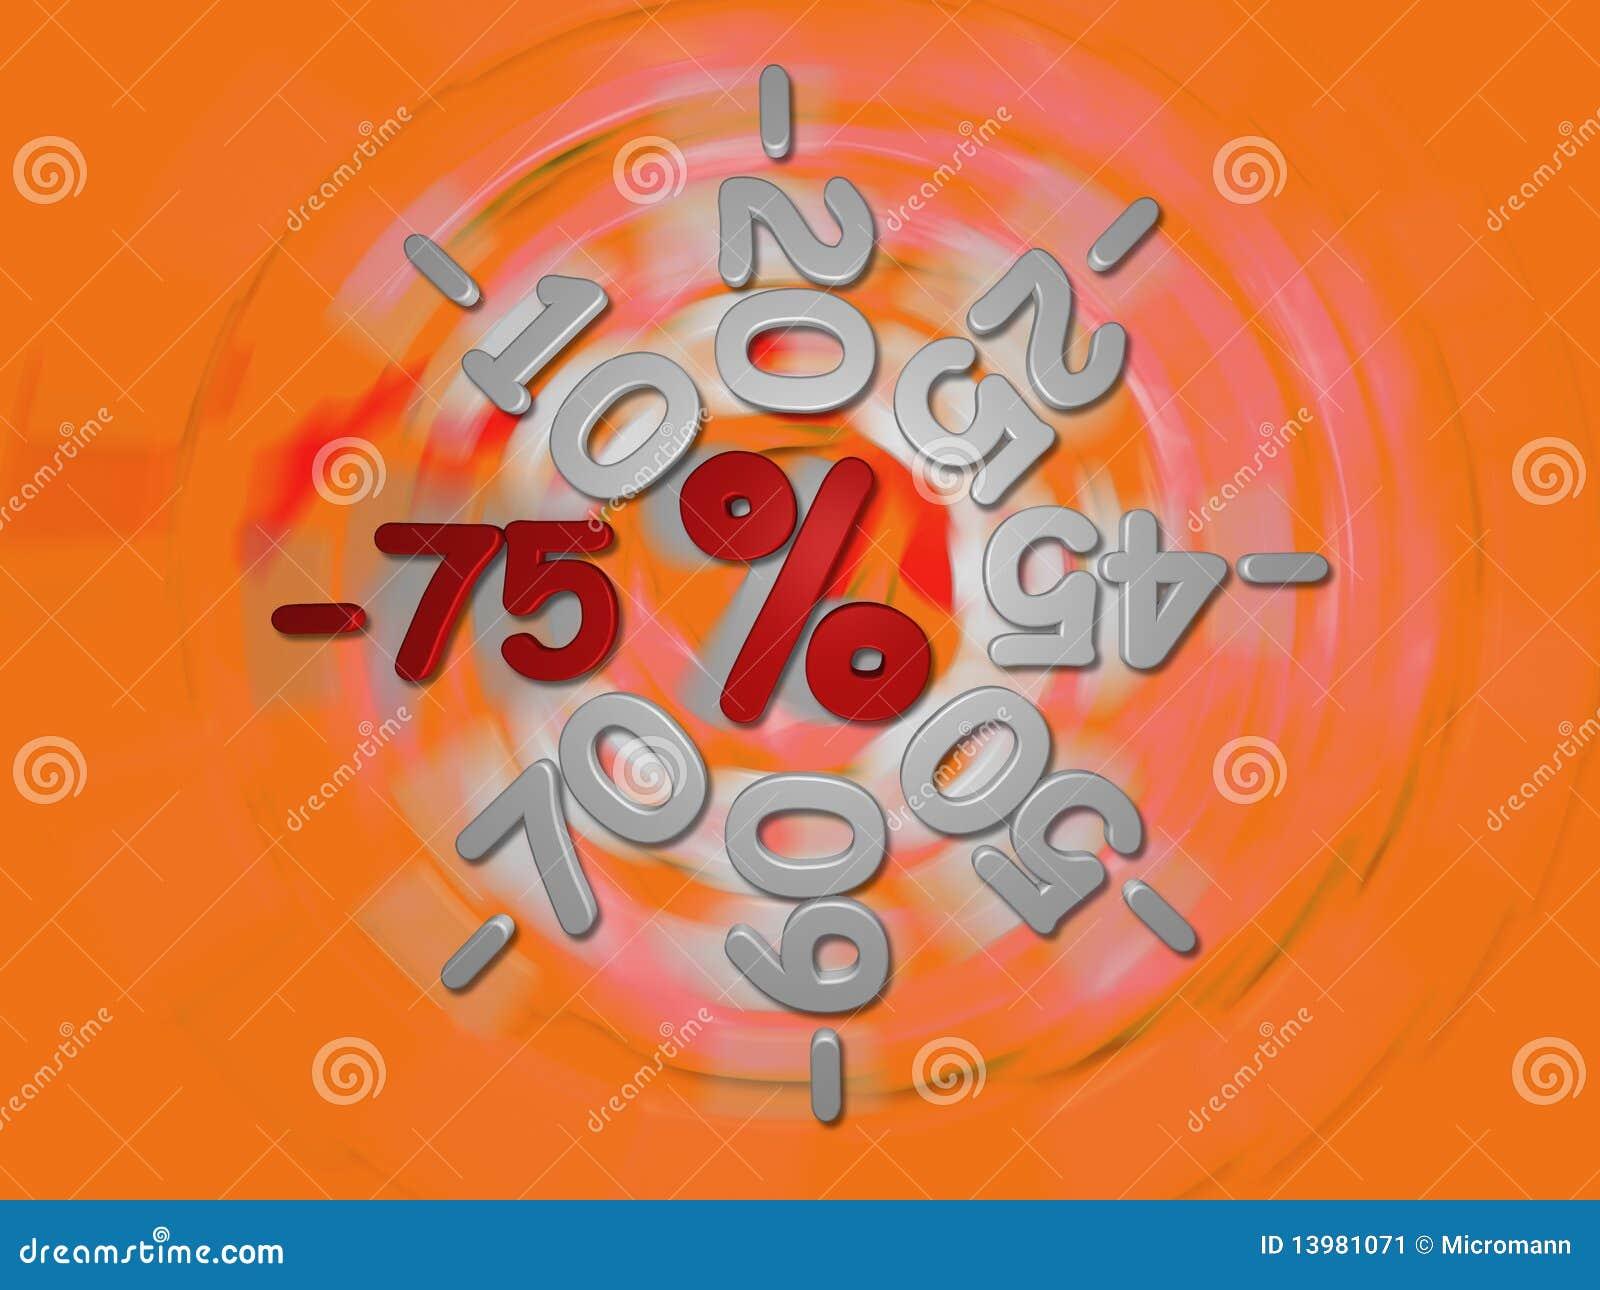 Discontos -75 por cento